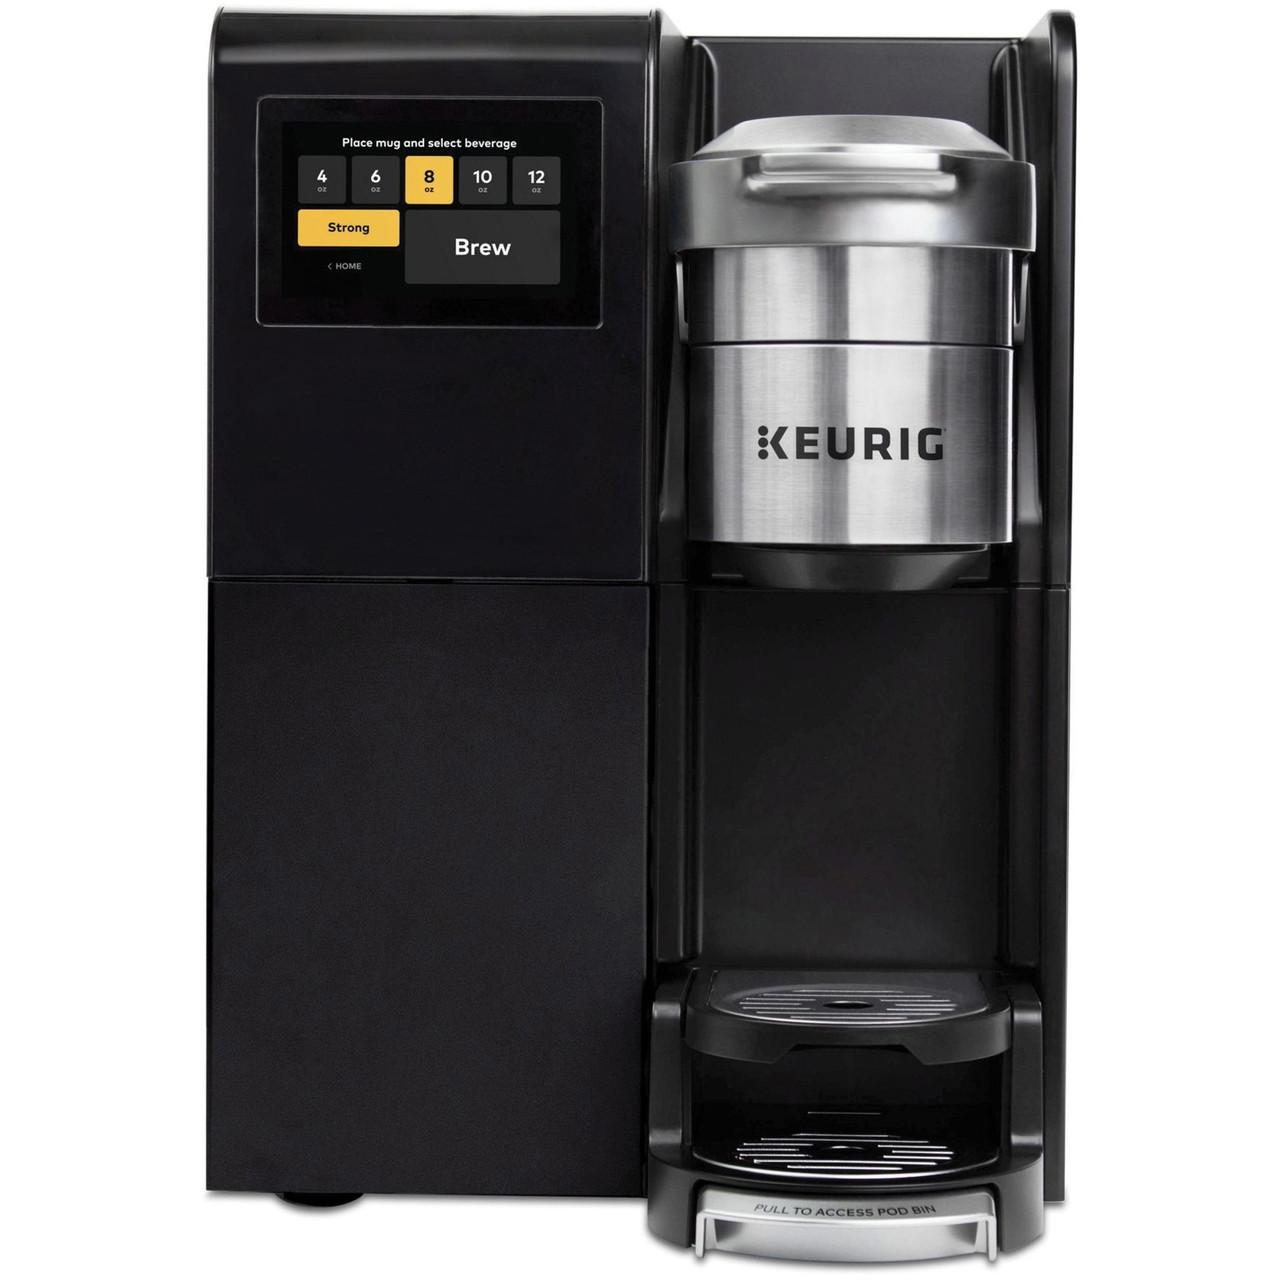 Keurig K-3500 Single Serve Commercial Coffee Maker GMT8066